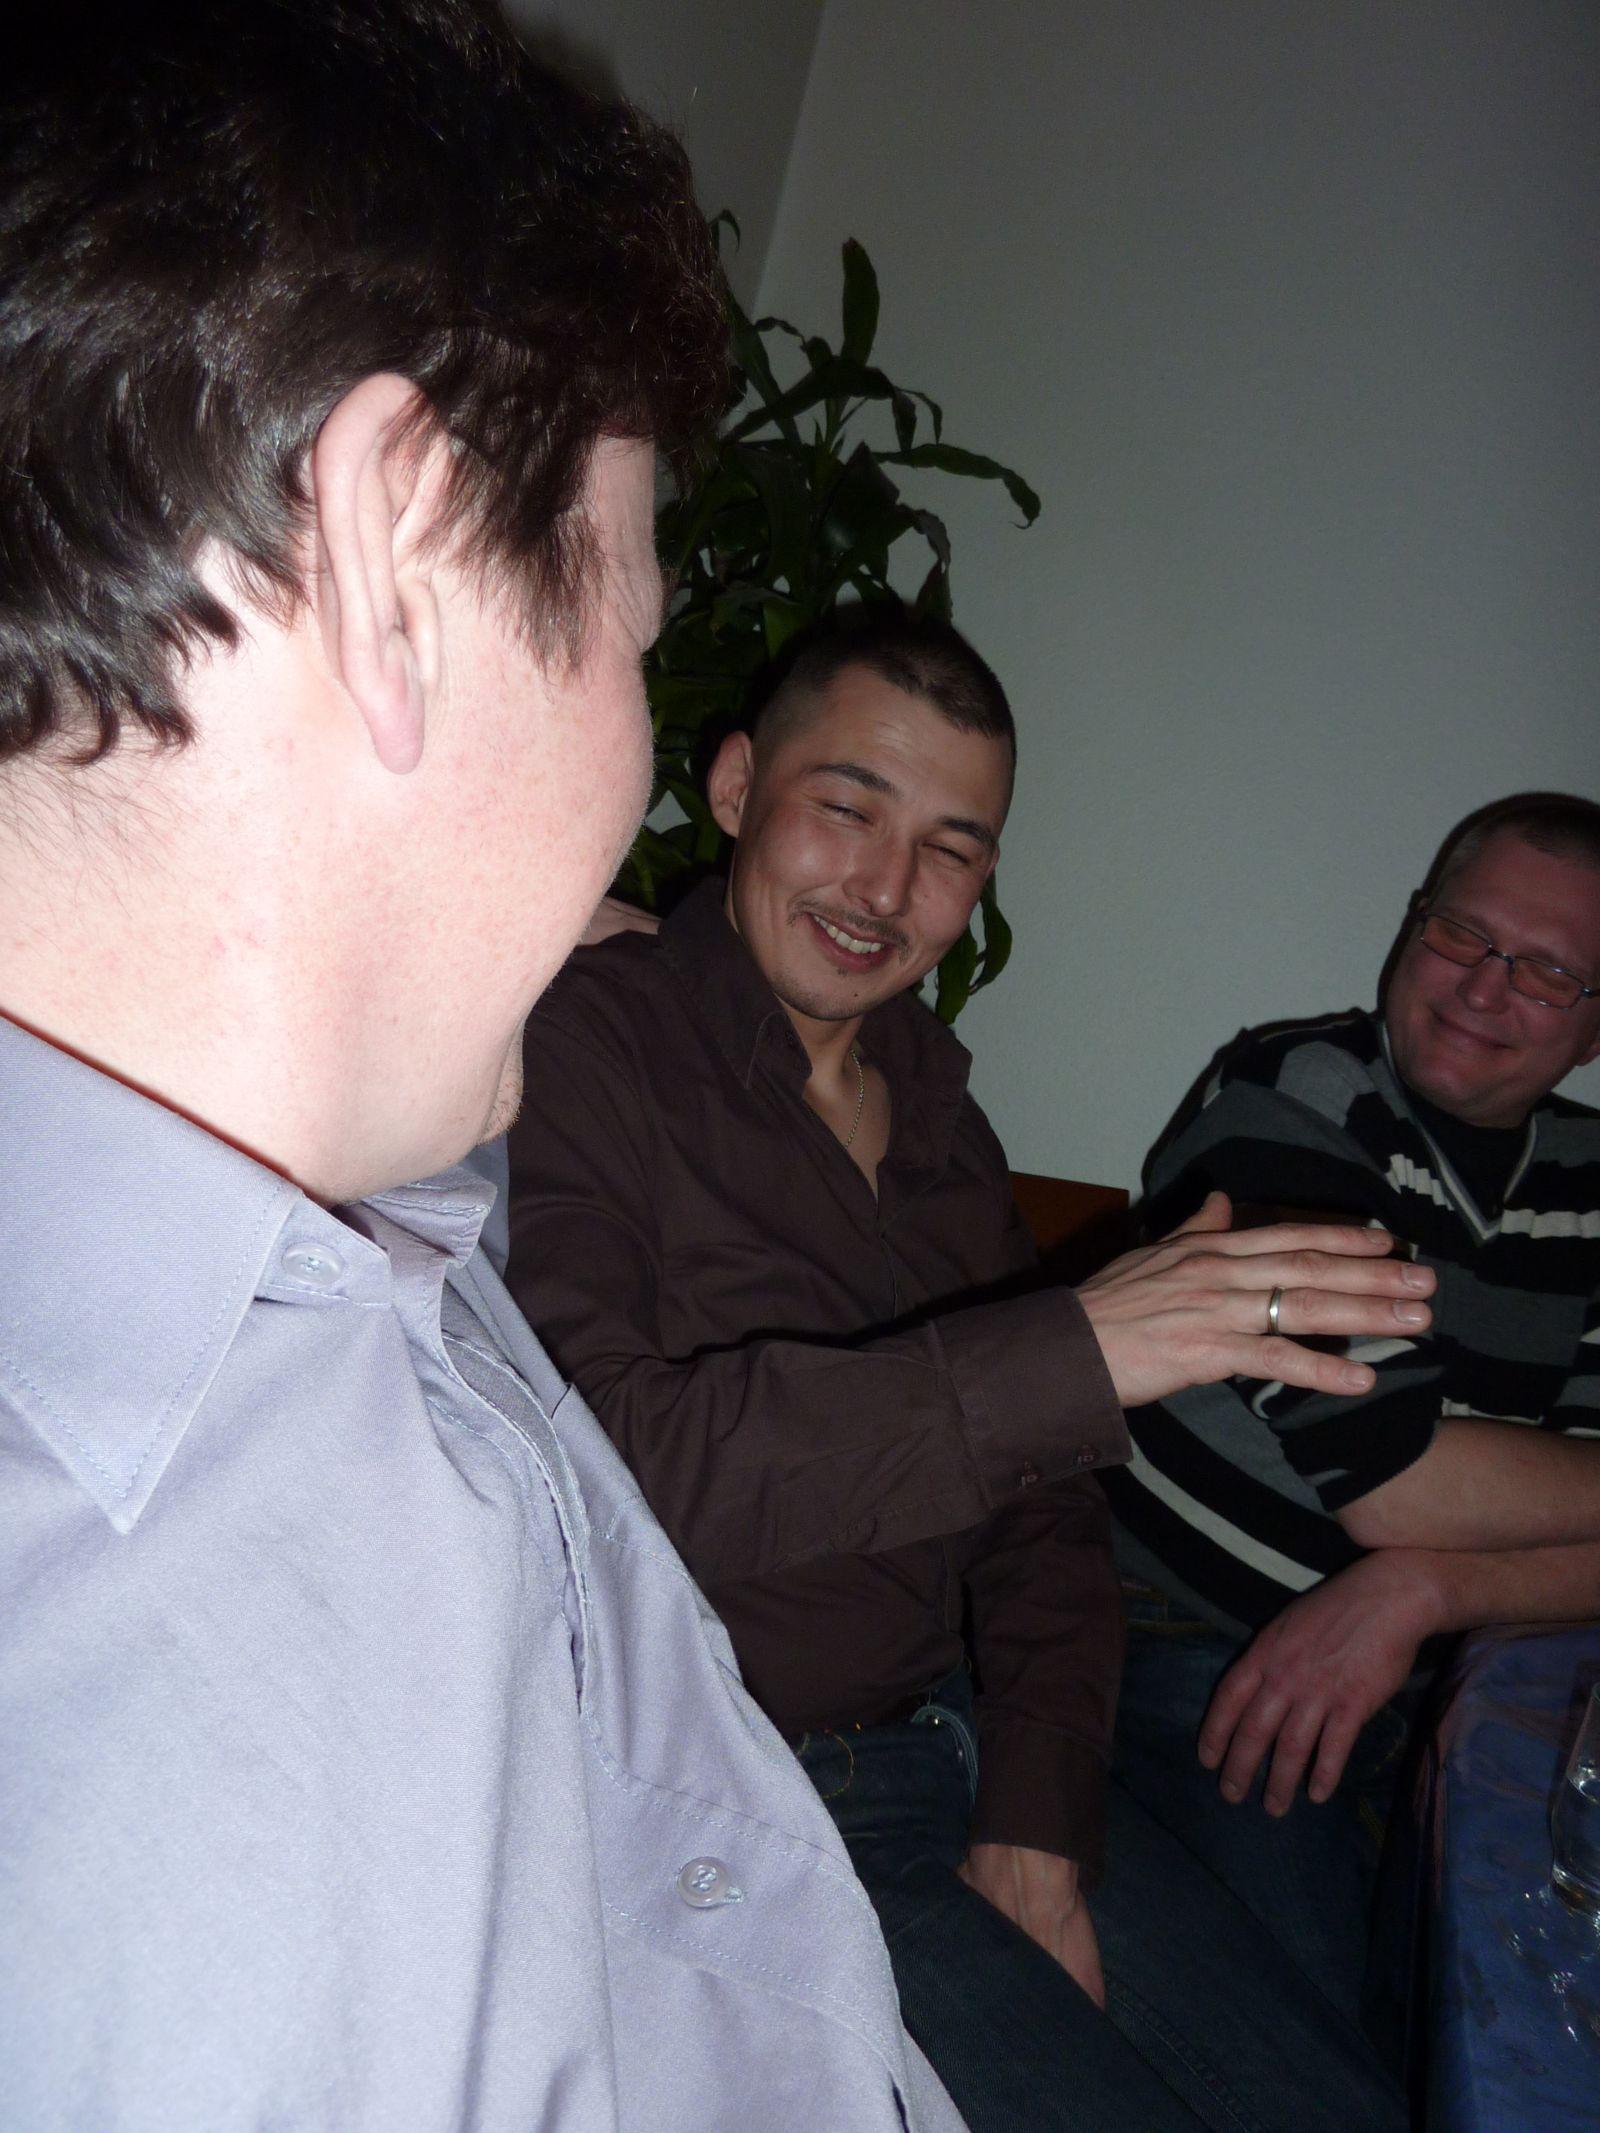 2010-03-14-0142_-_Peter_; Søren Labansen